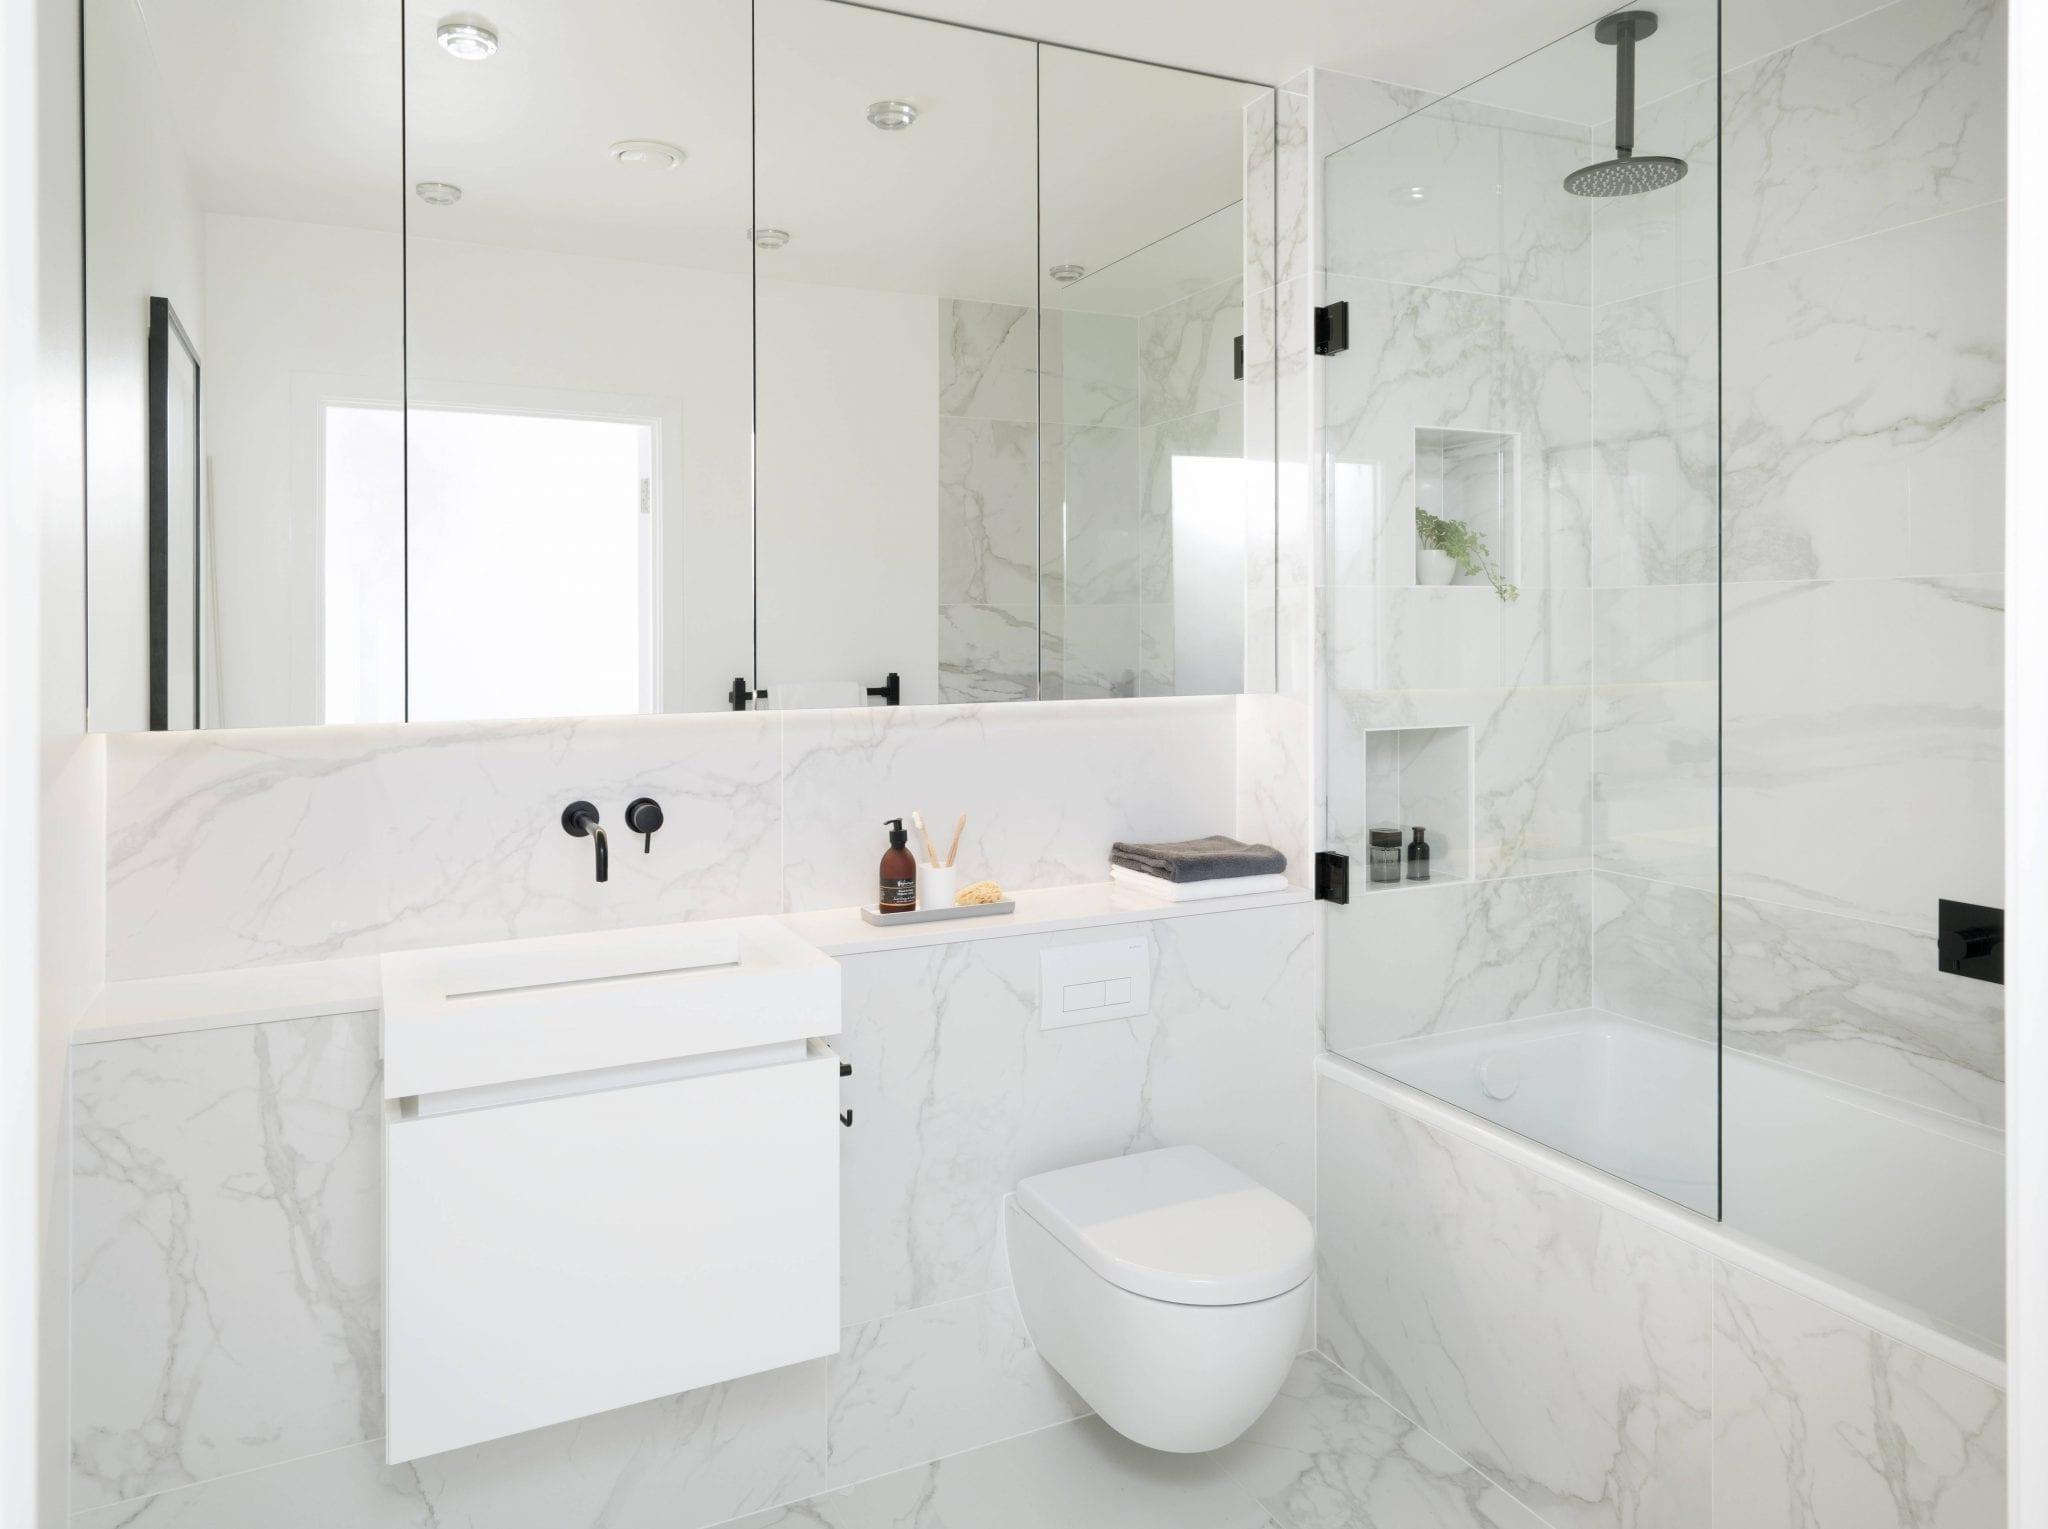 Bathrooms - Amberth - Bathroom Design and Installation London